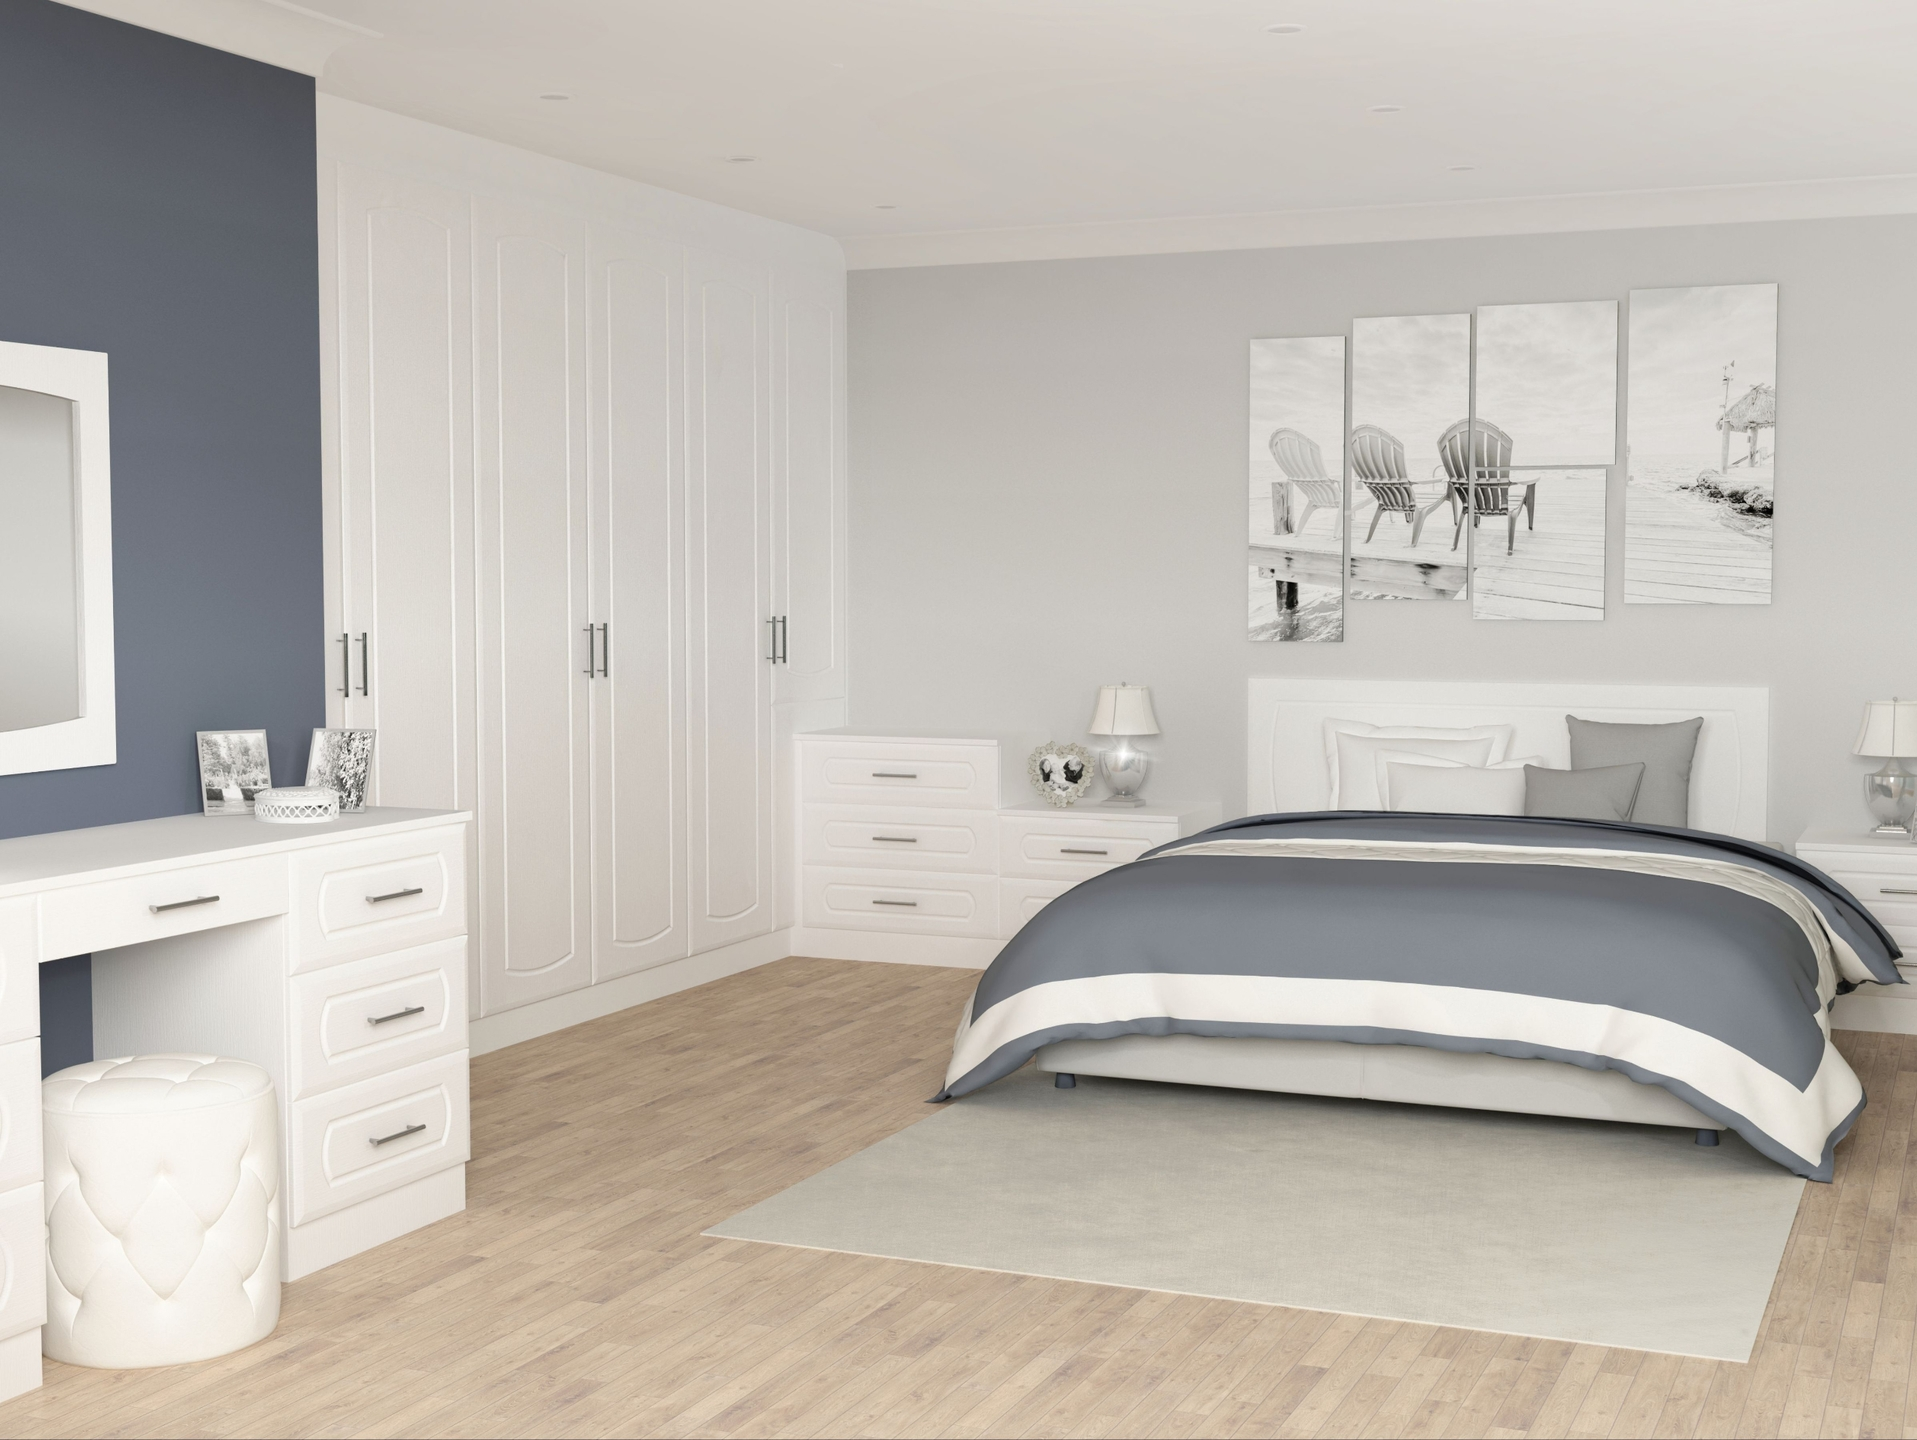 BB Trade Kitchens & Bedrooms Newcastle (@bbtradekitchens) Cover Image